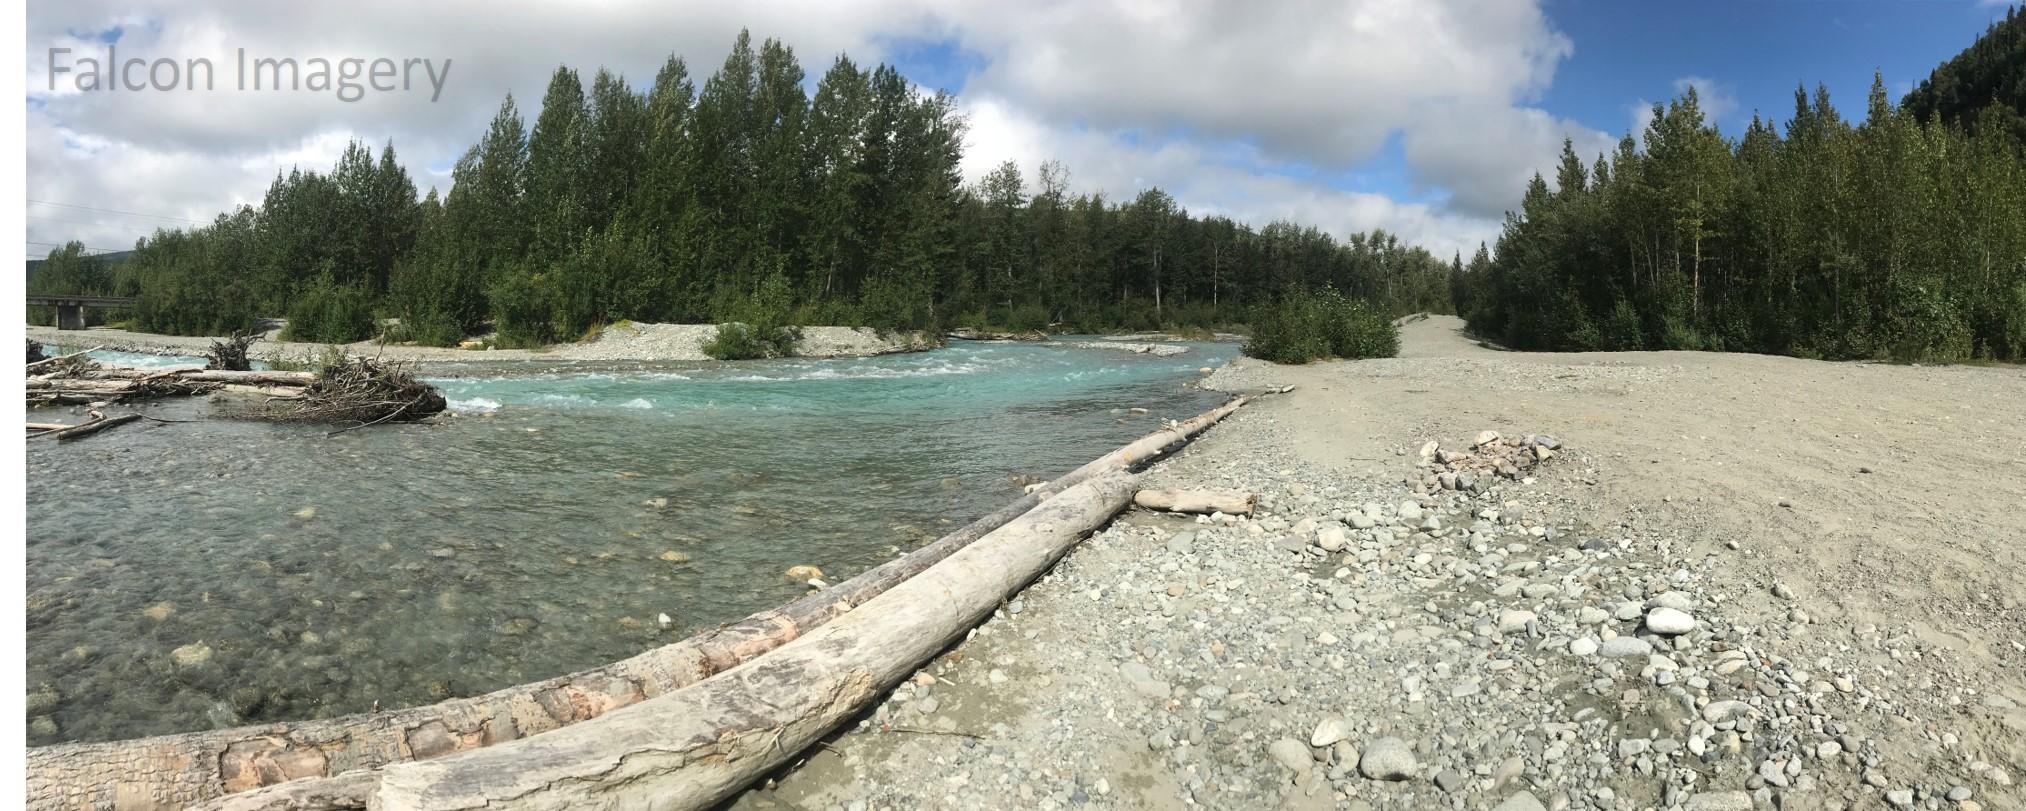 King River, Alaska